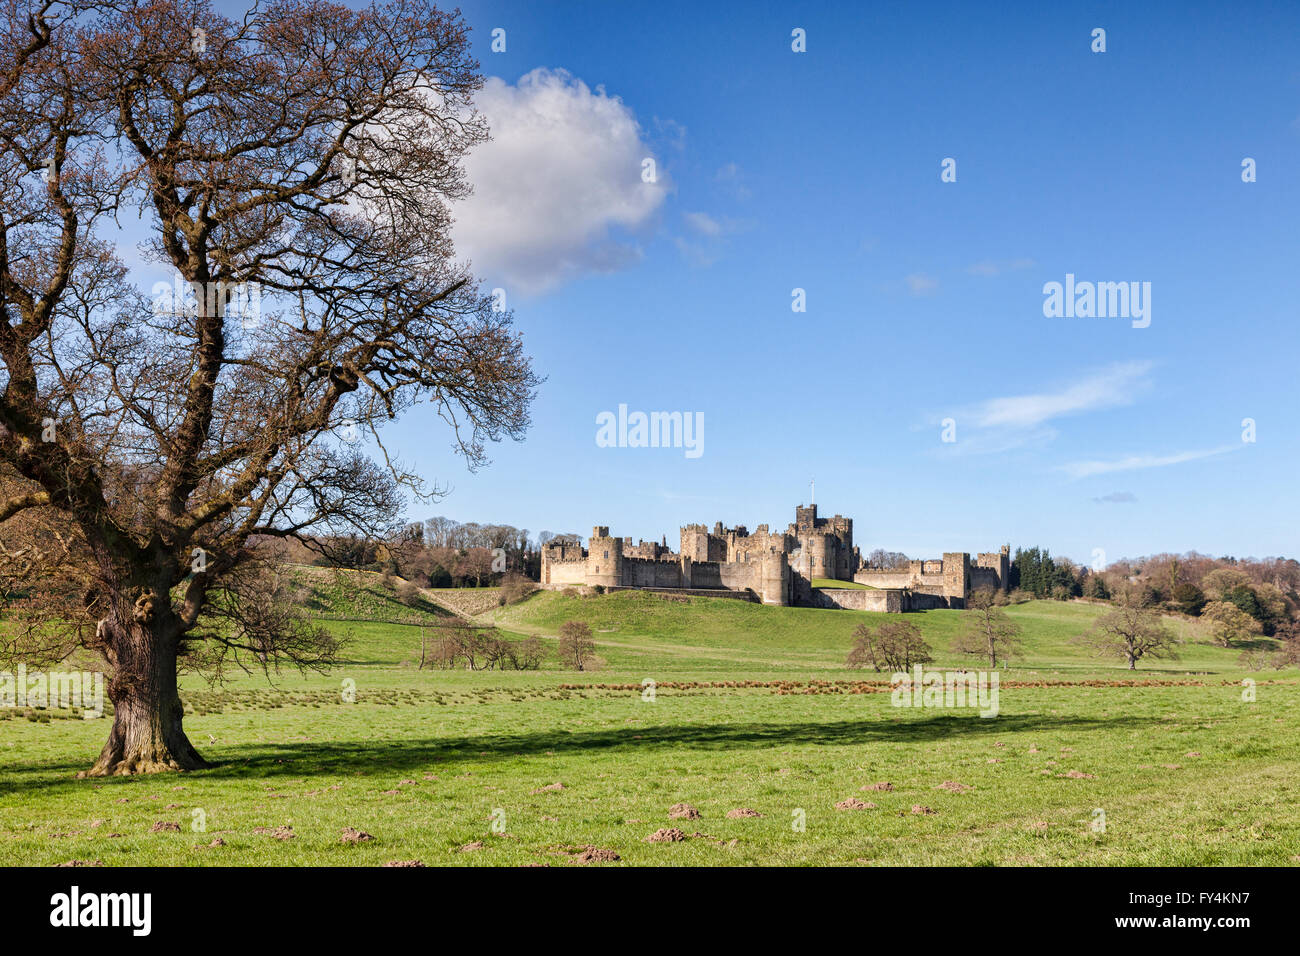 Spring at Alnwick Castle, Northumberland, England, UK - Stock Image